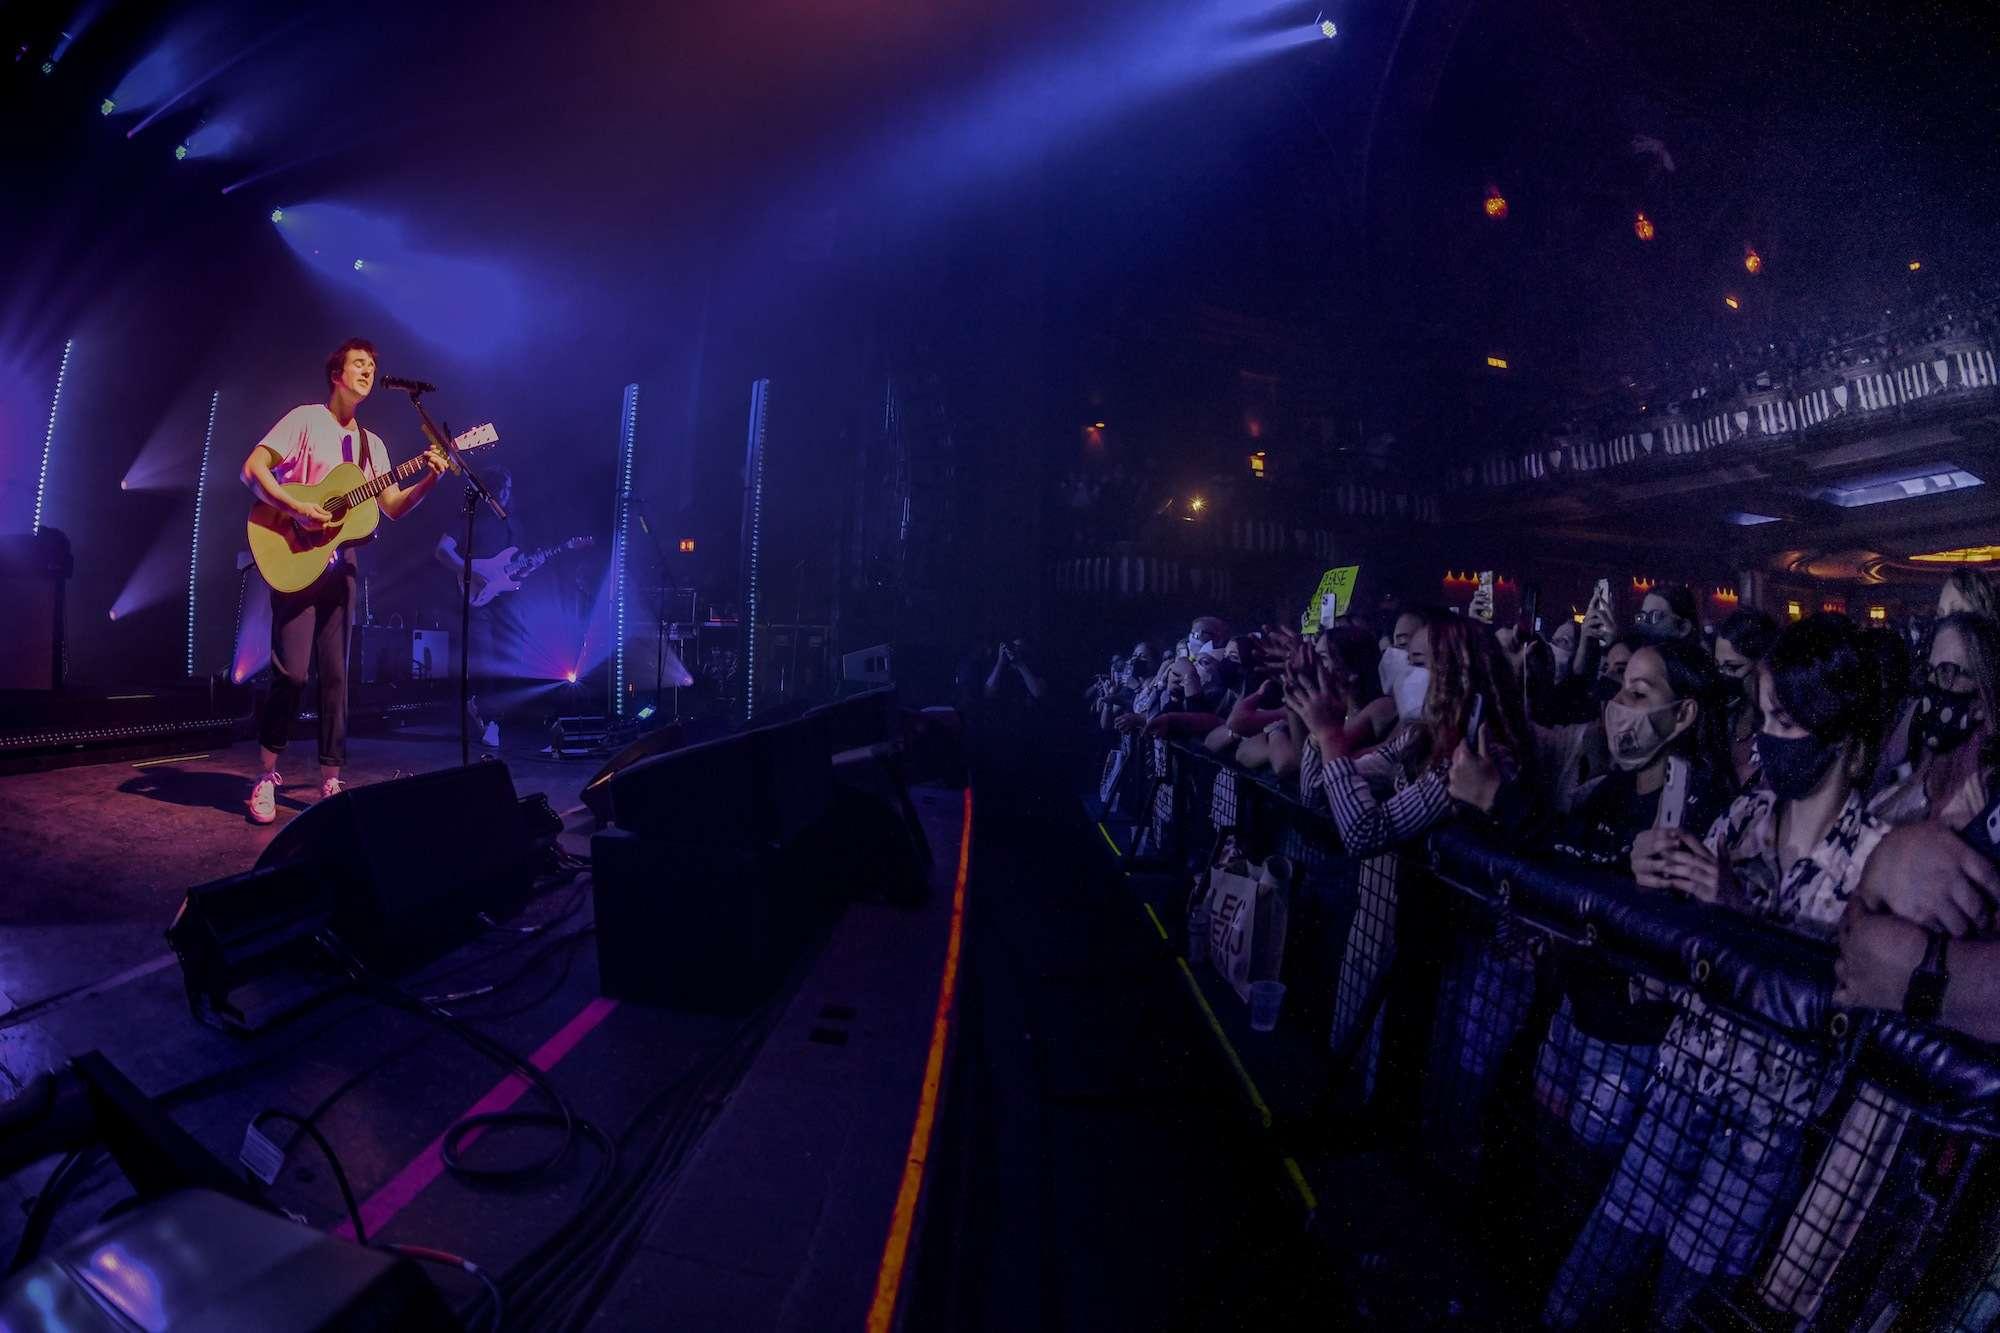 Alec Benjamin Live at Riviera [GALLERY] 11